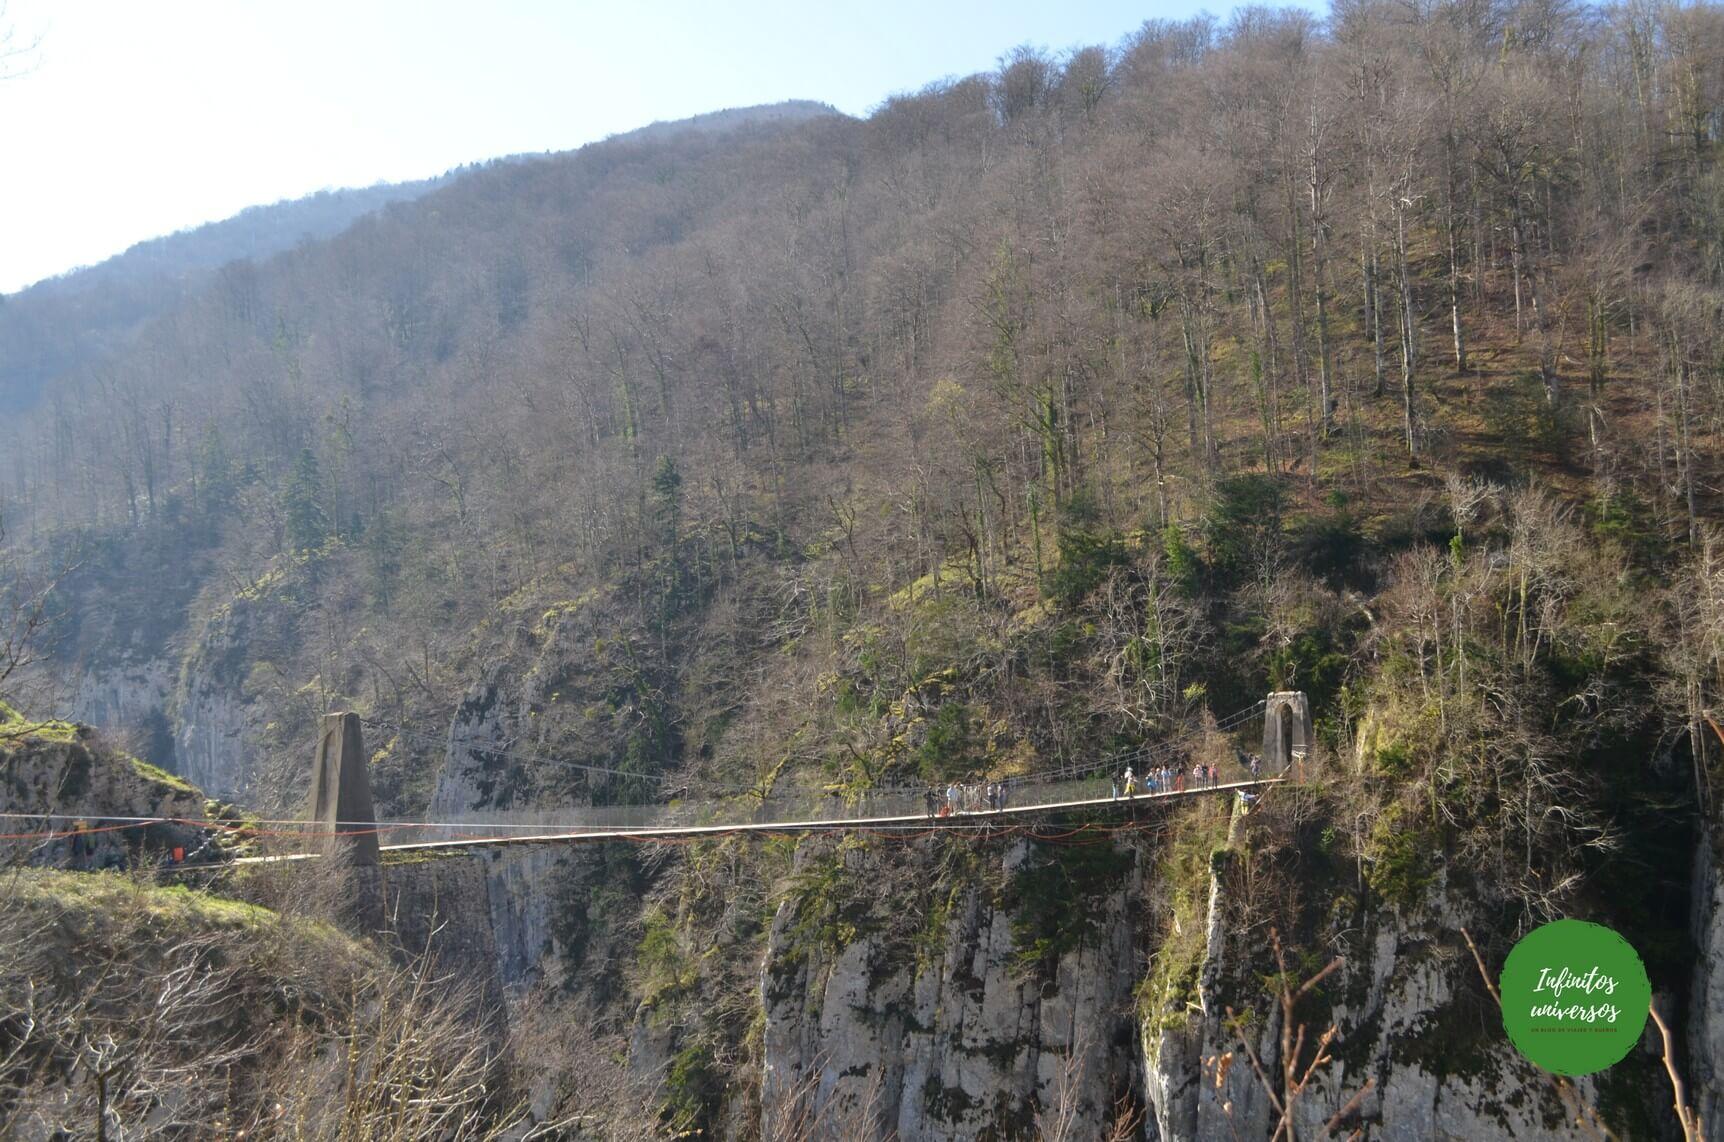 Holtzarte ruta puente colgante de holtzarte pasarela de holtzarte y garganta de kakueta